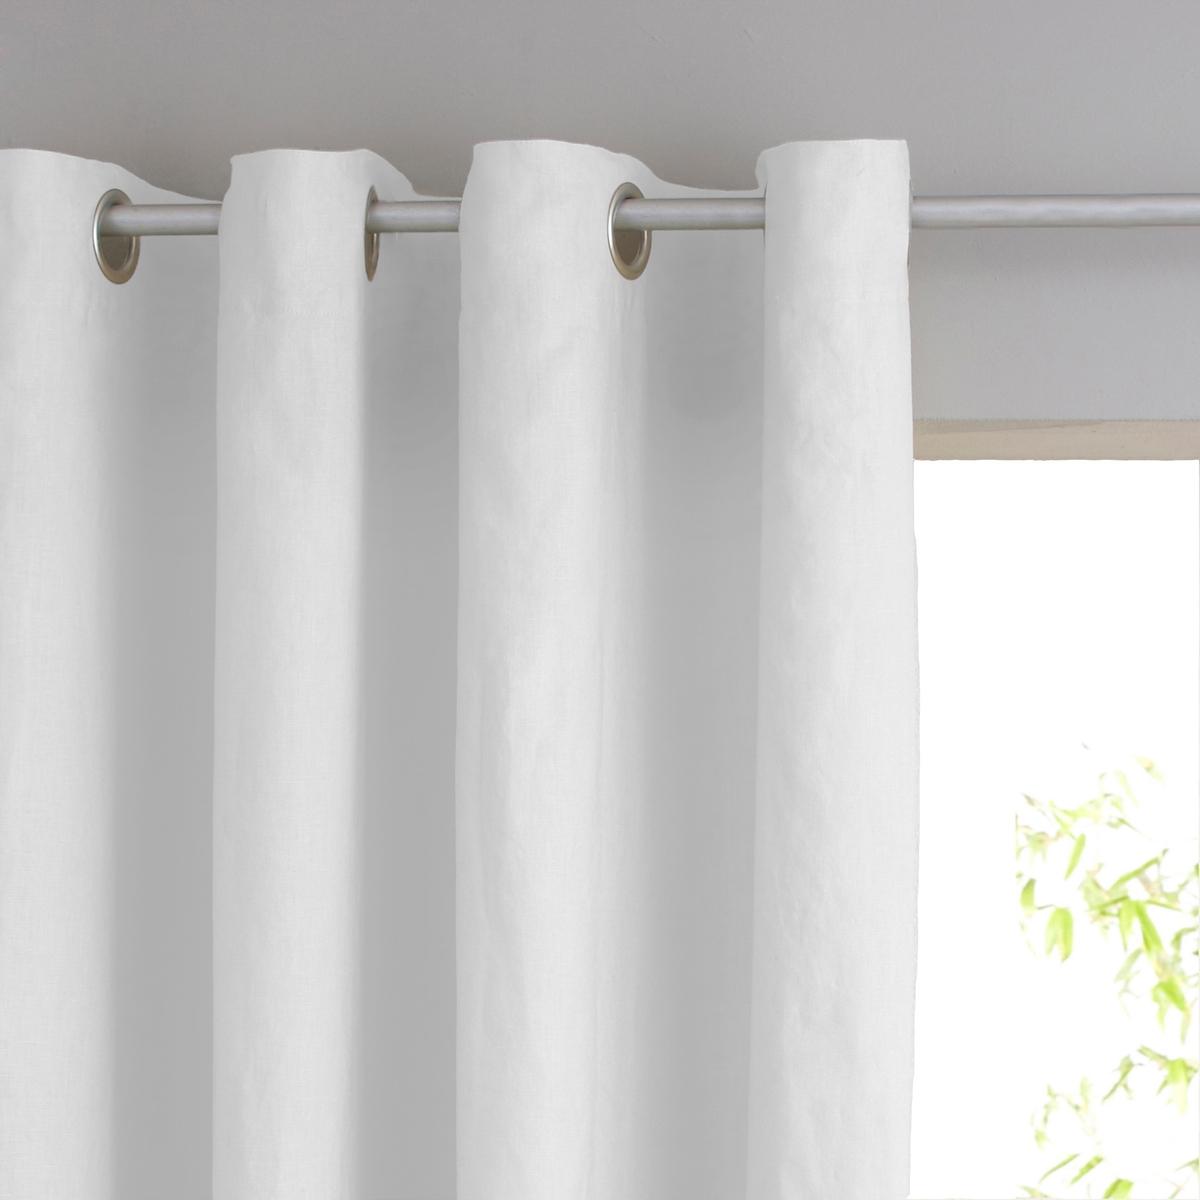 Штора из стираного льна на подкладке, с люверсами, Private римская штора tanaro quelle my home 736242 в ш ок 140 140 см